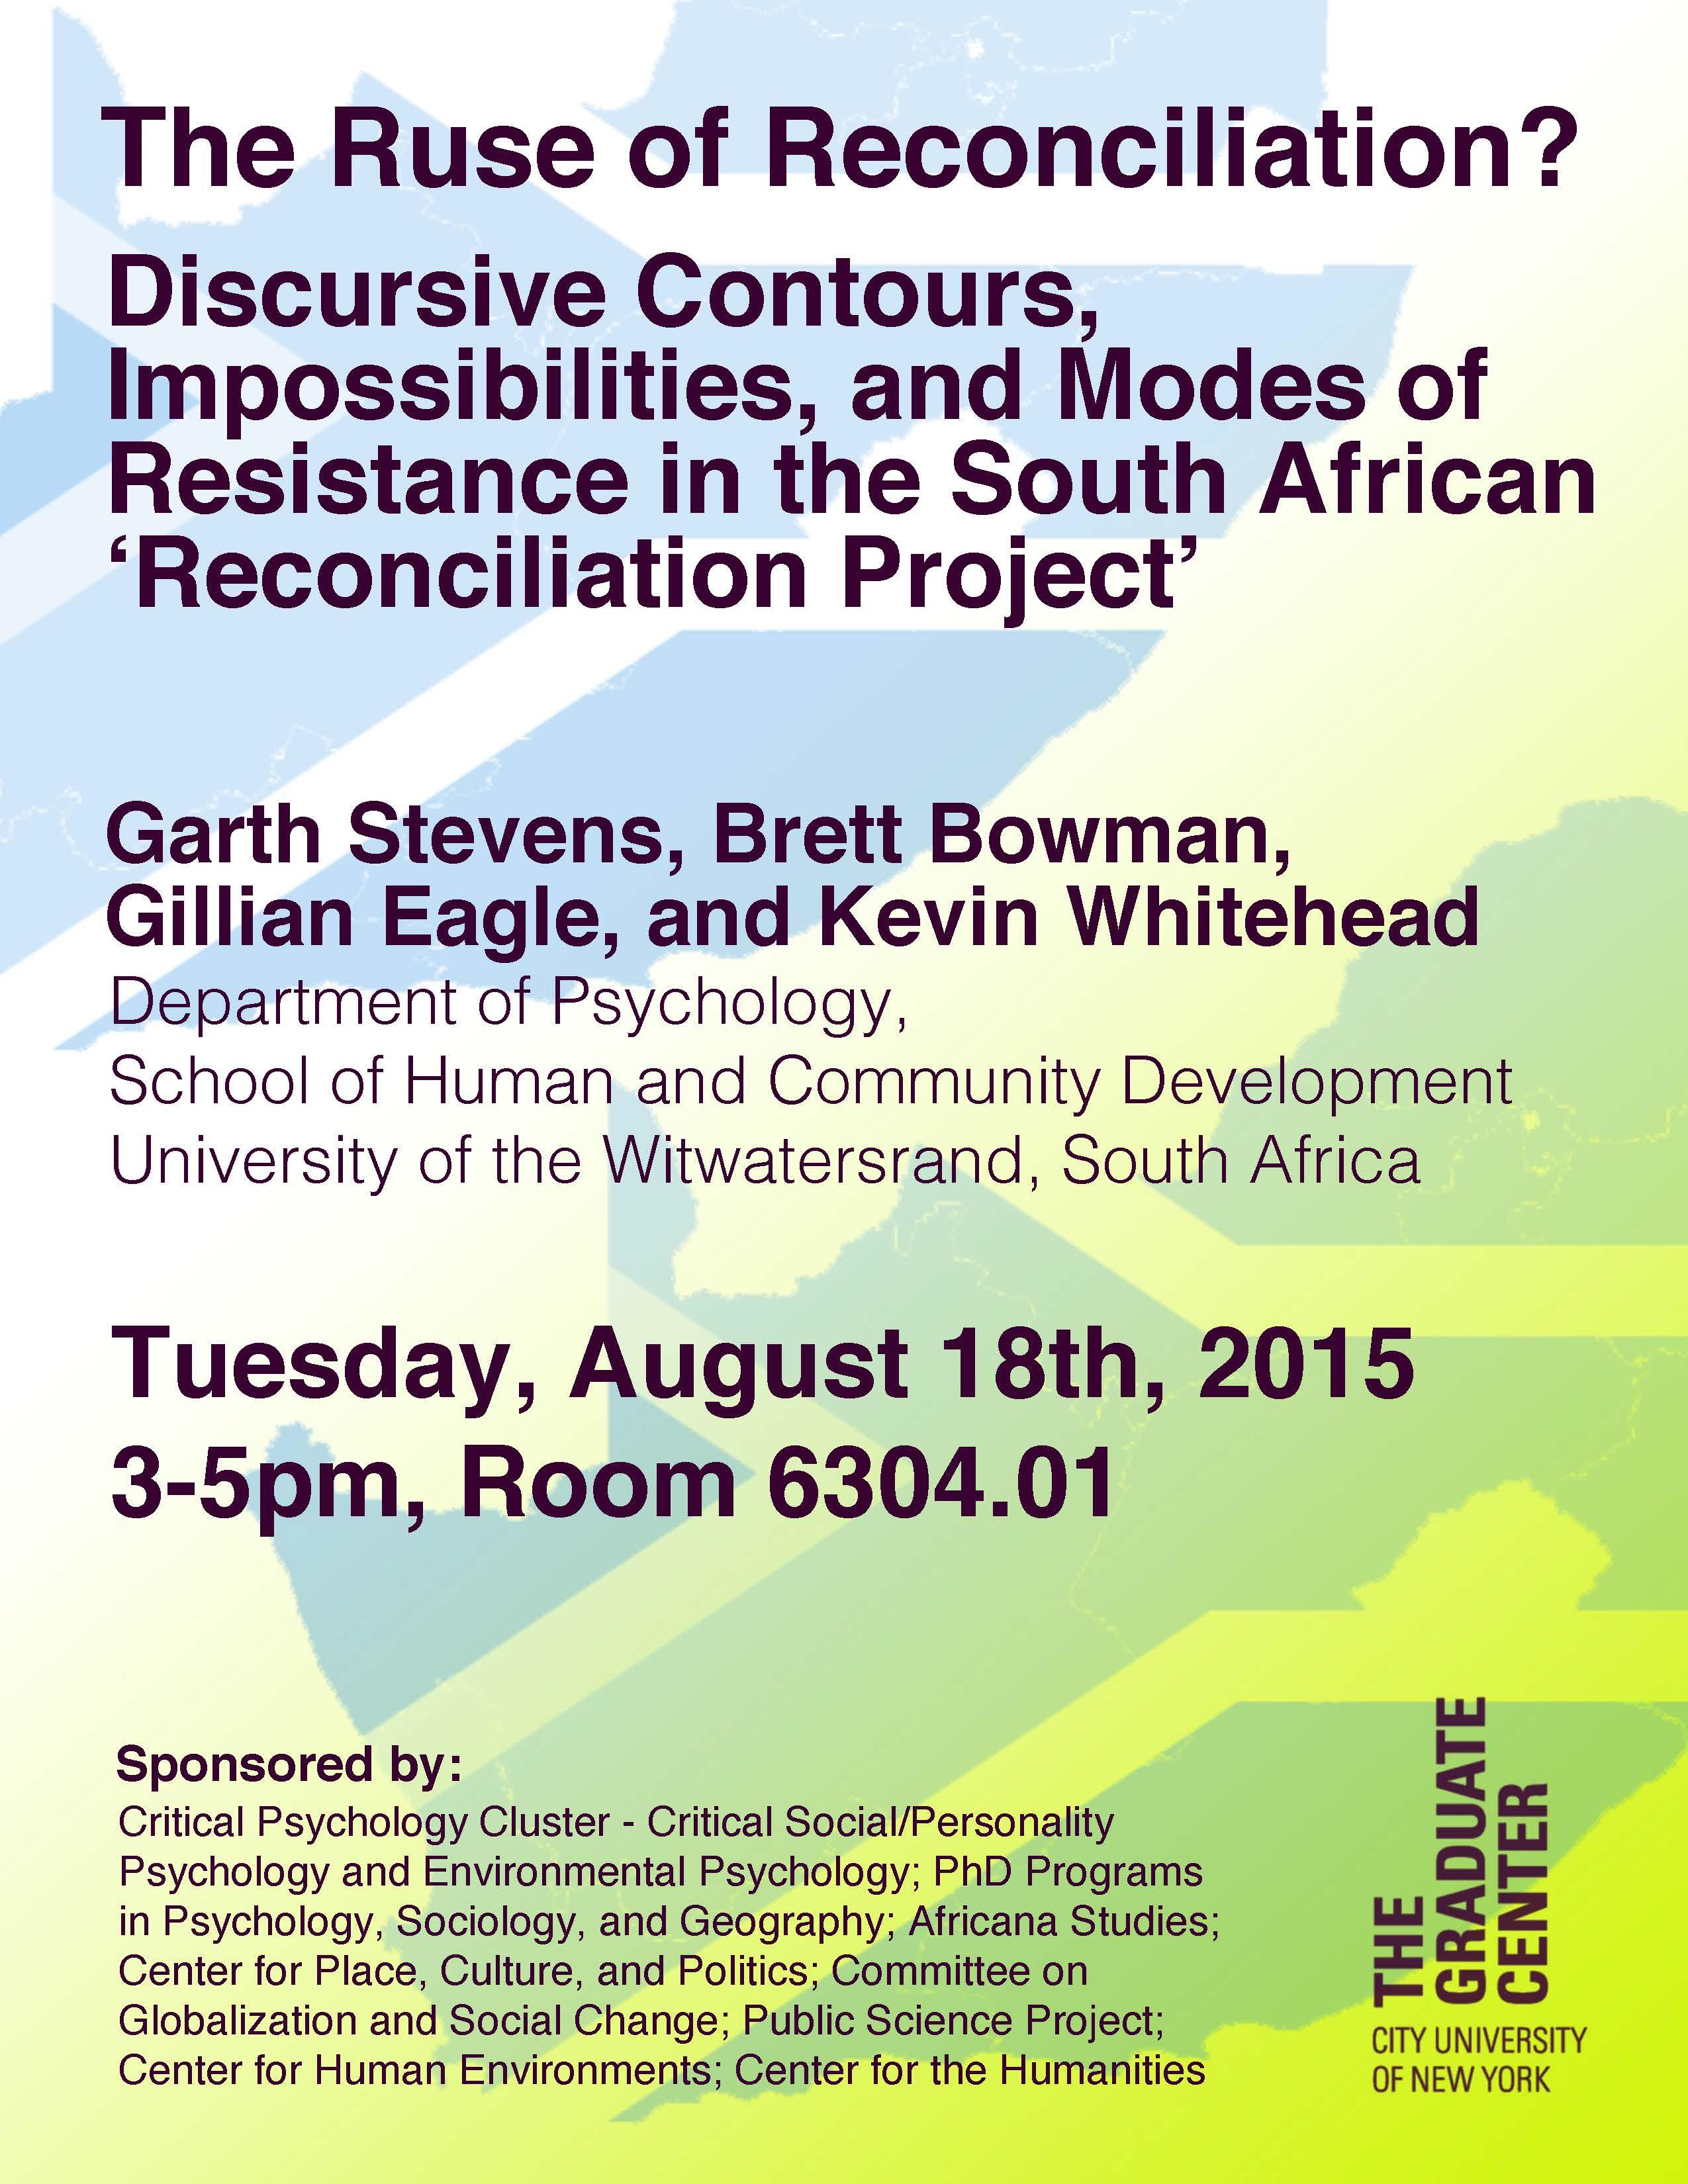 The Ruse of Reconciliation? ; Garth Stevens, Brett Bowman, Gillian Eagle, & Kevin Whitehead: Tuesday, August 18th, 2015, 3:00-5:00 pm